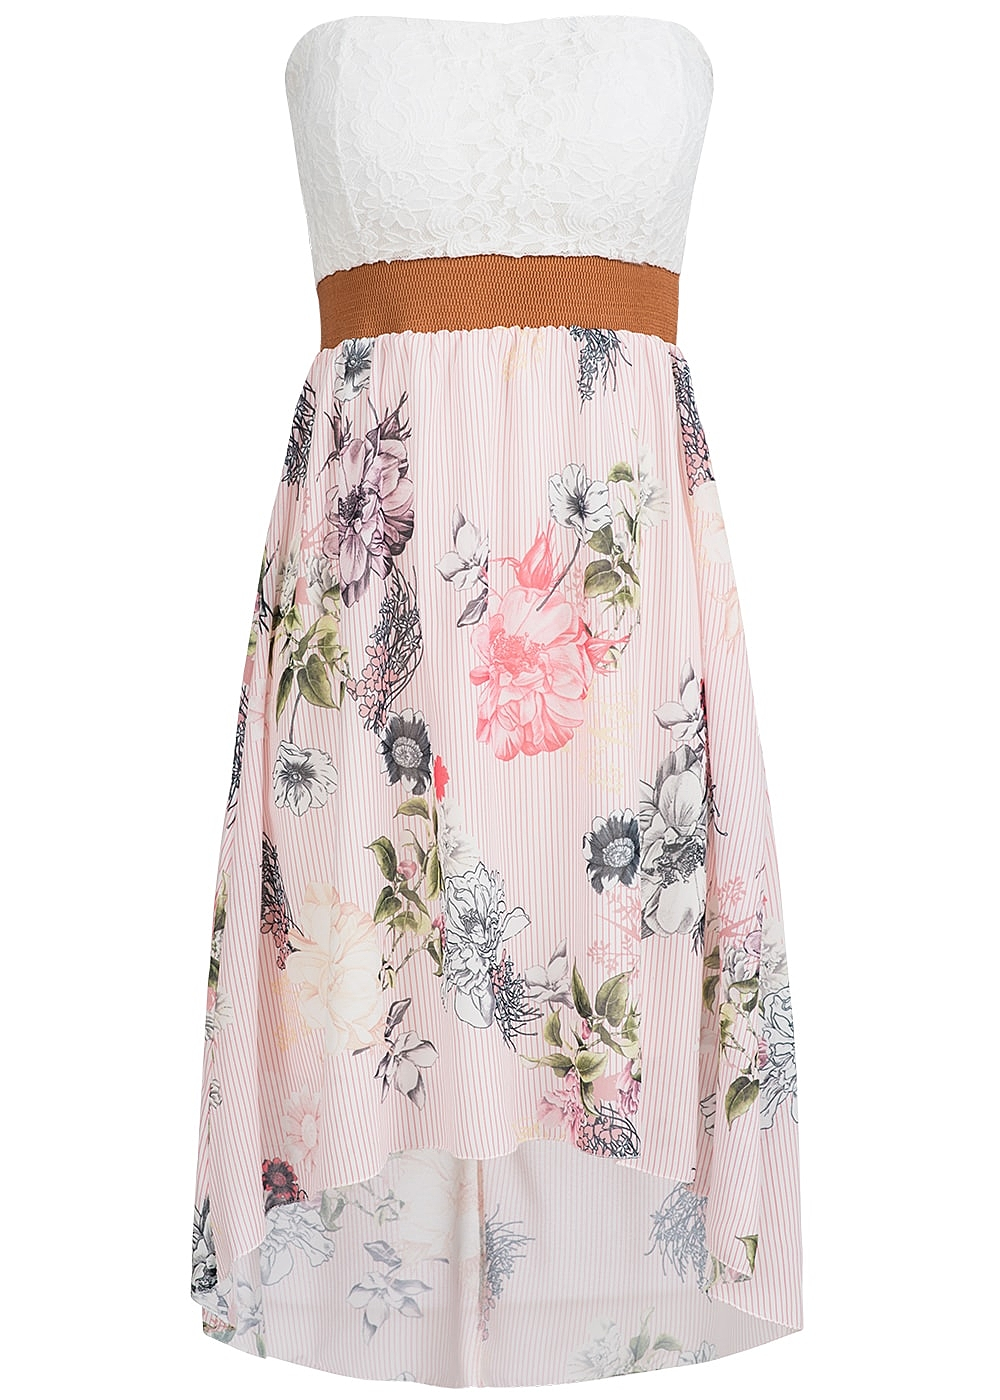 3d3189c85ce styleboom fashion damen mini bandeau kleid blumen muster spitze brustpads rosa  weiss br 77onlineshop